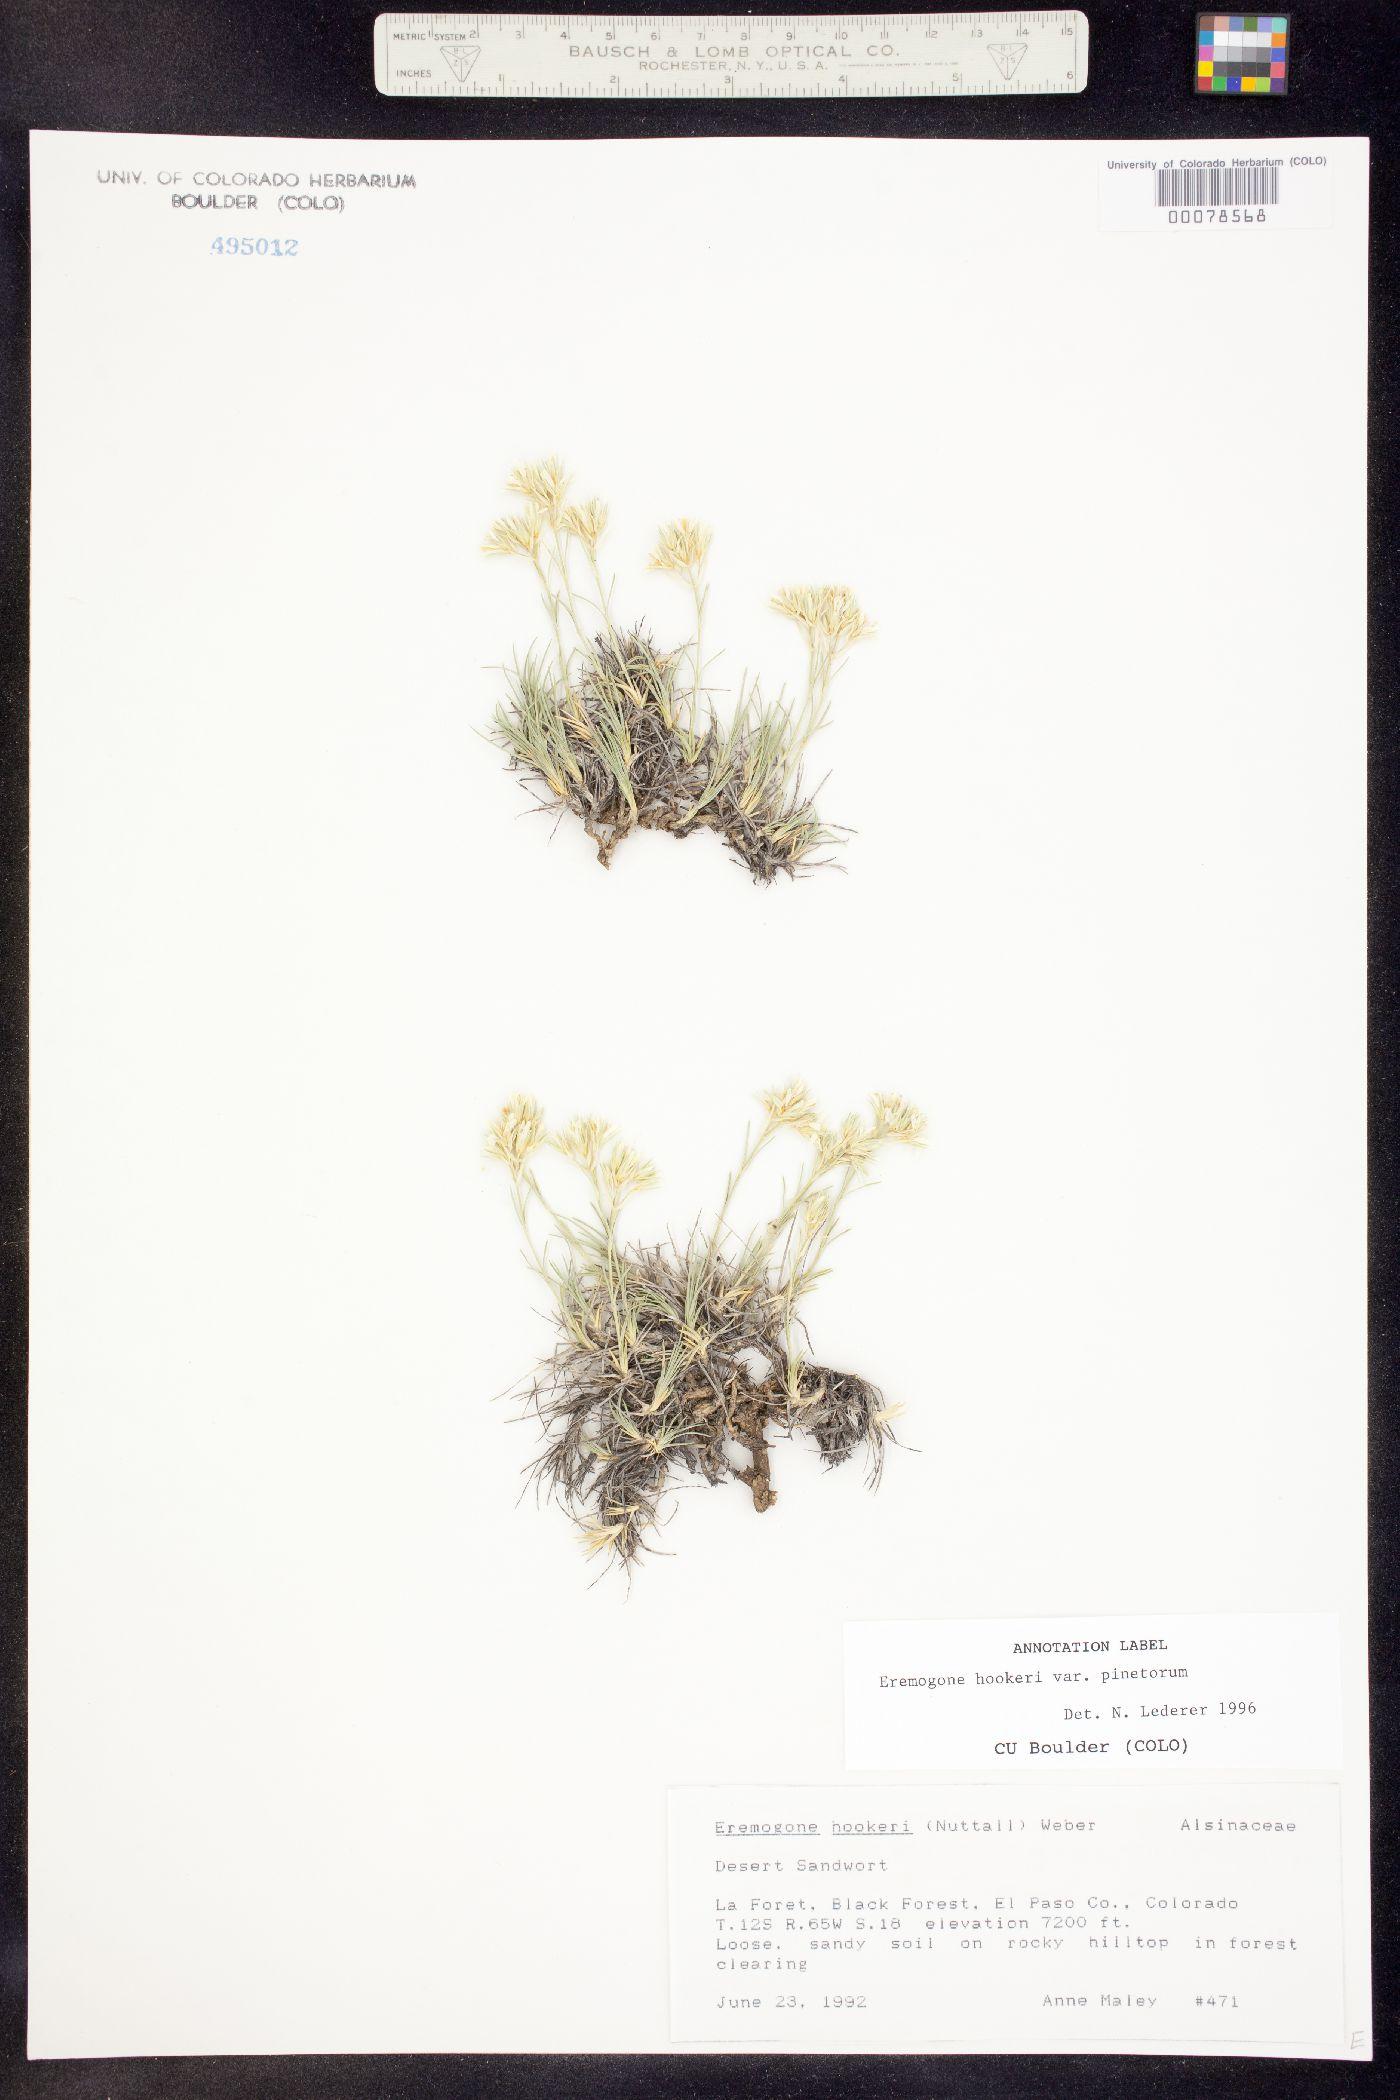 Eremogone hookeri subsp. pinetorum image